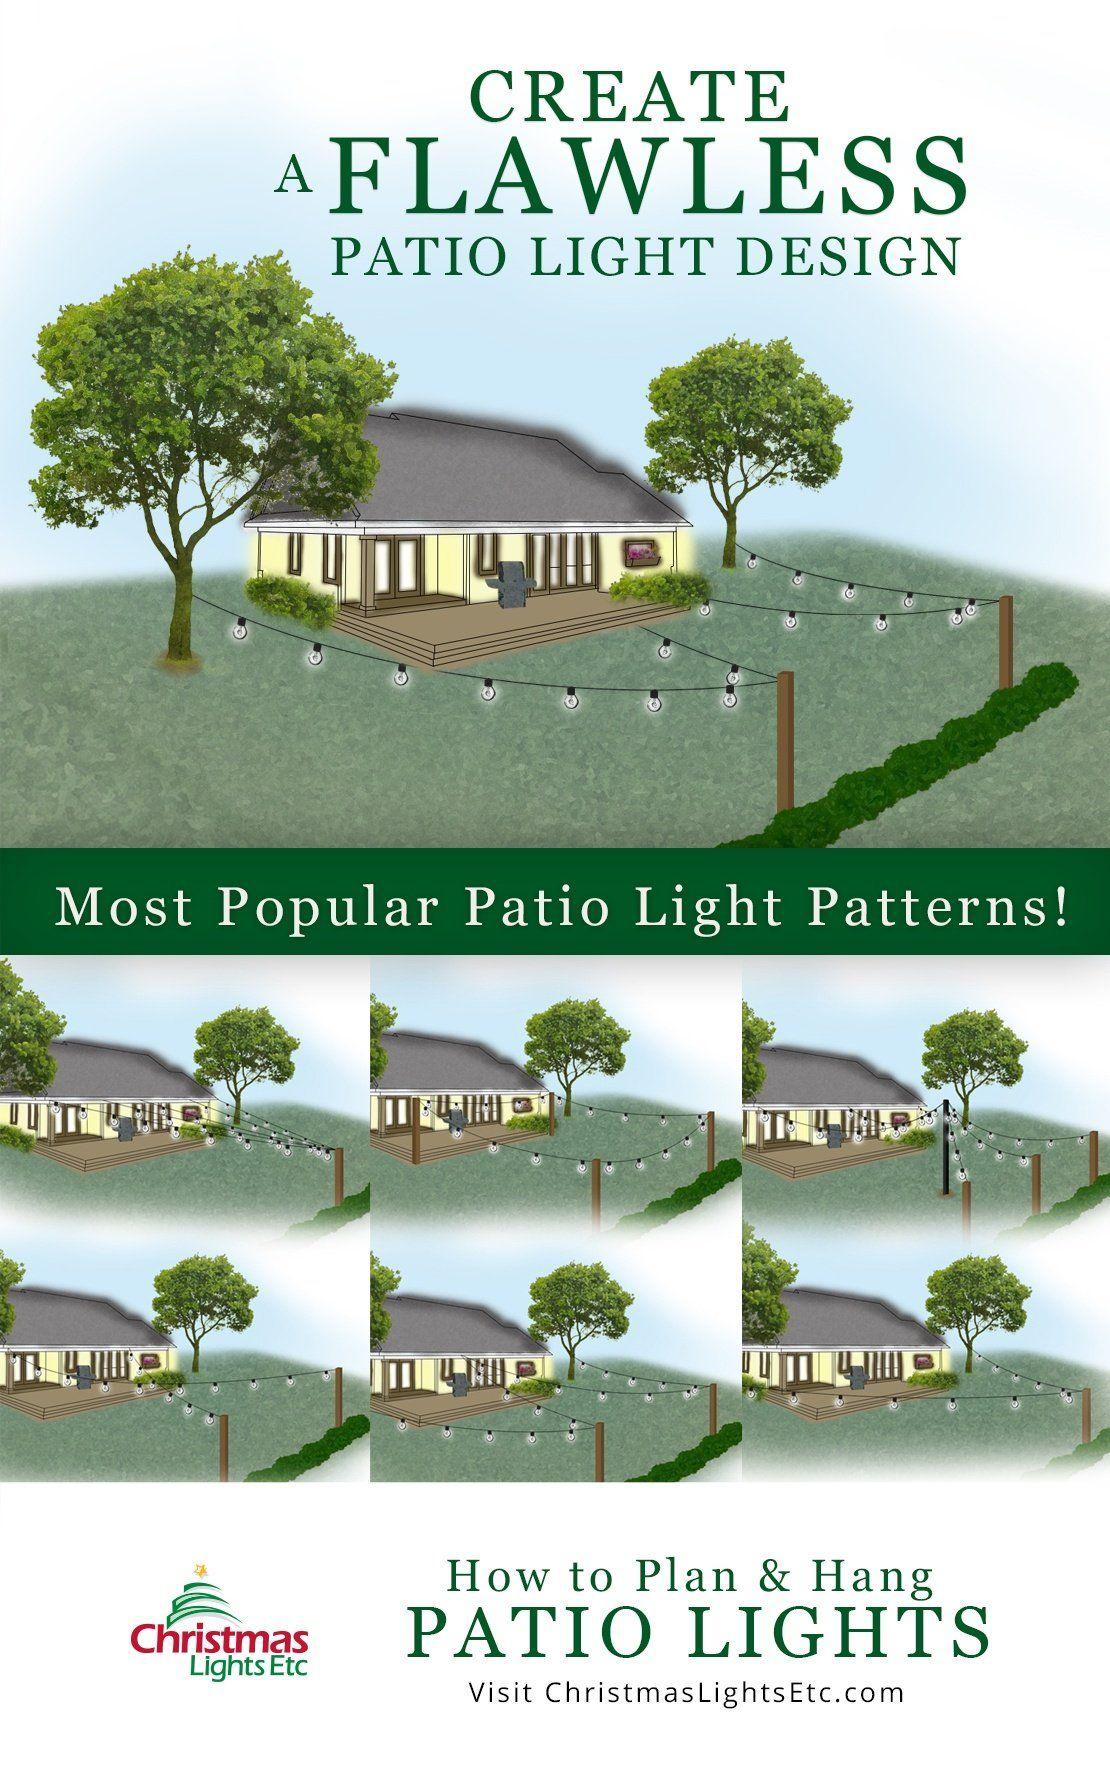 How To Plan And Hang Patio Lights With Images Backyard Backyard Lighting Outdoor Wedding Lighting